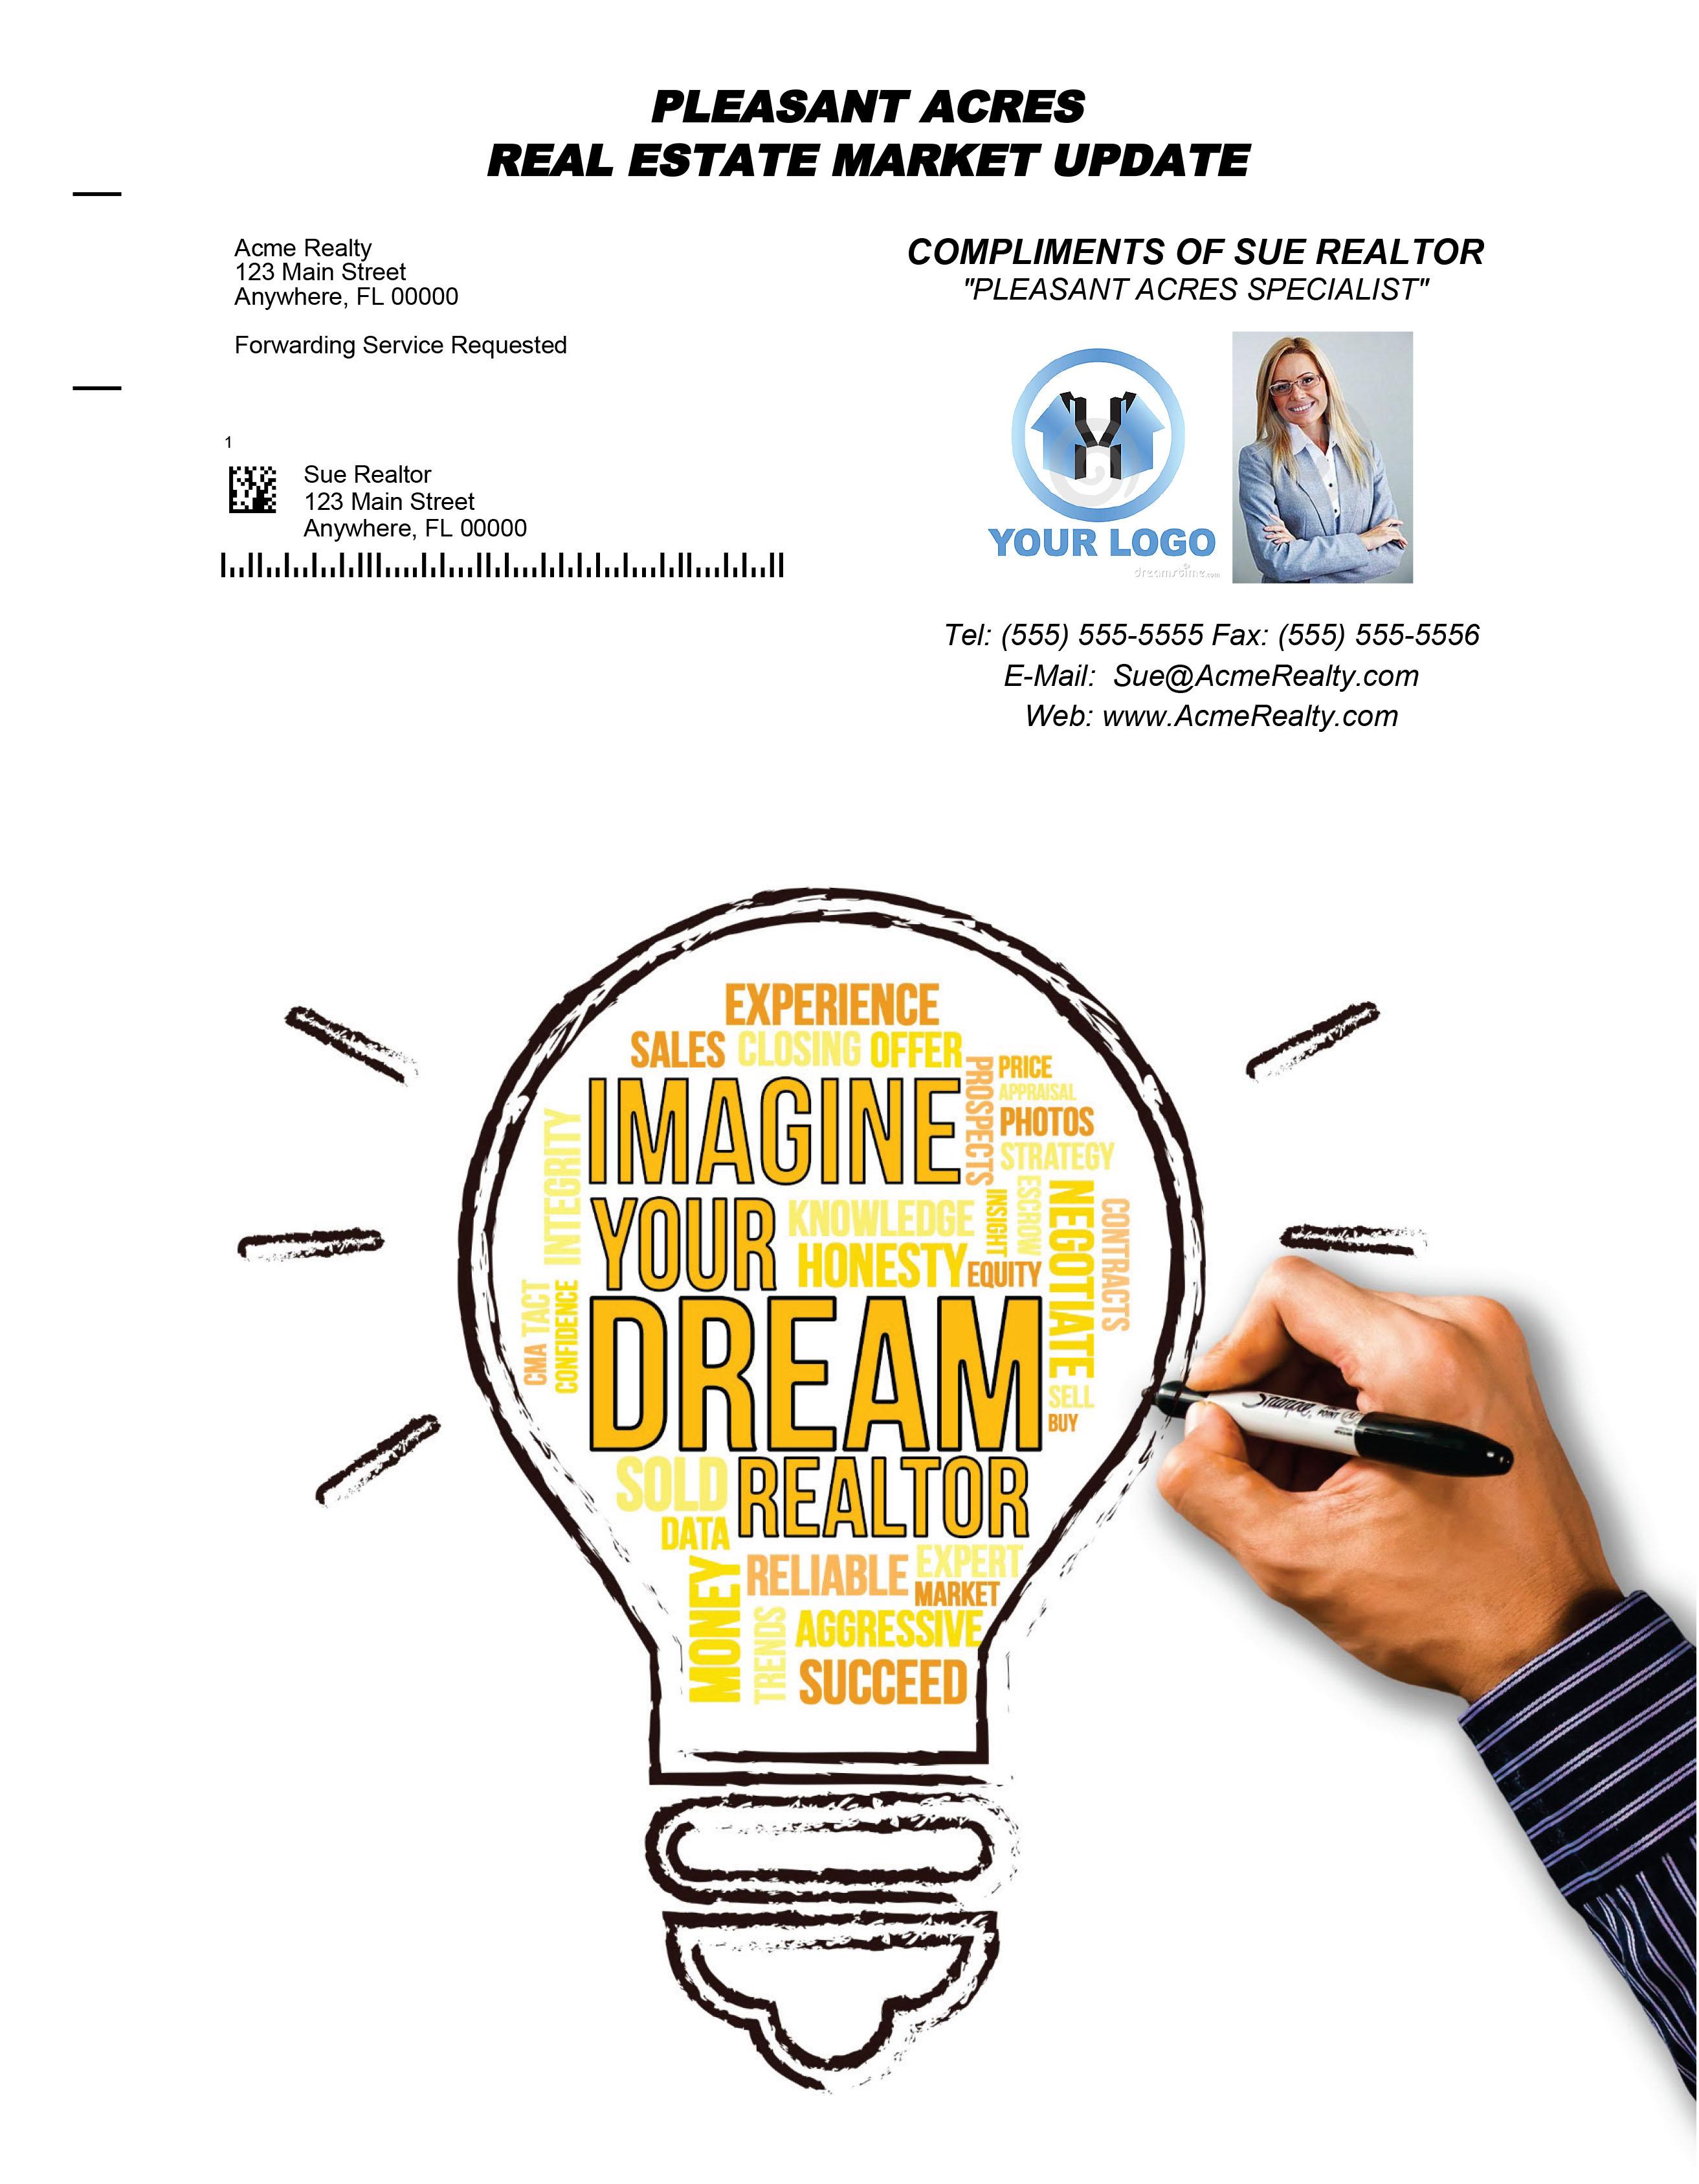 Imagine Your Dream Realtor